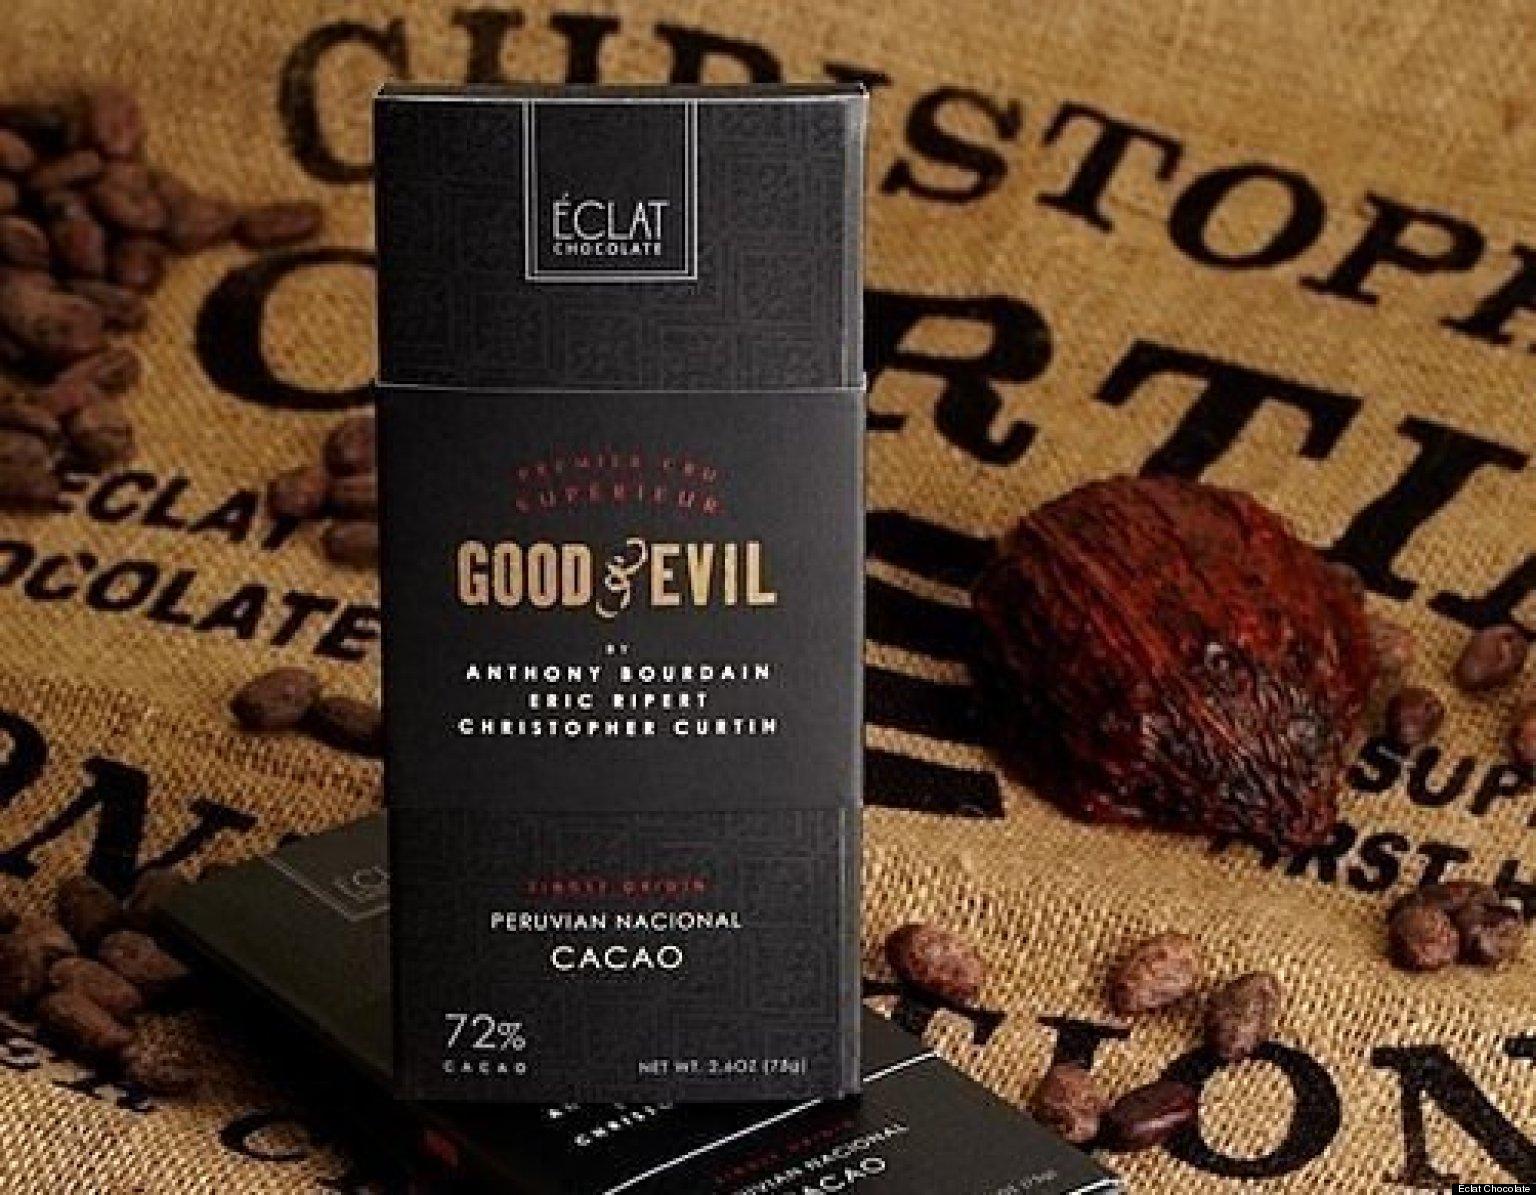 Anthony Bourdain And Eric Ripert's Chocolate Bar, Good & Evil, To ...